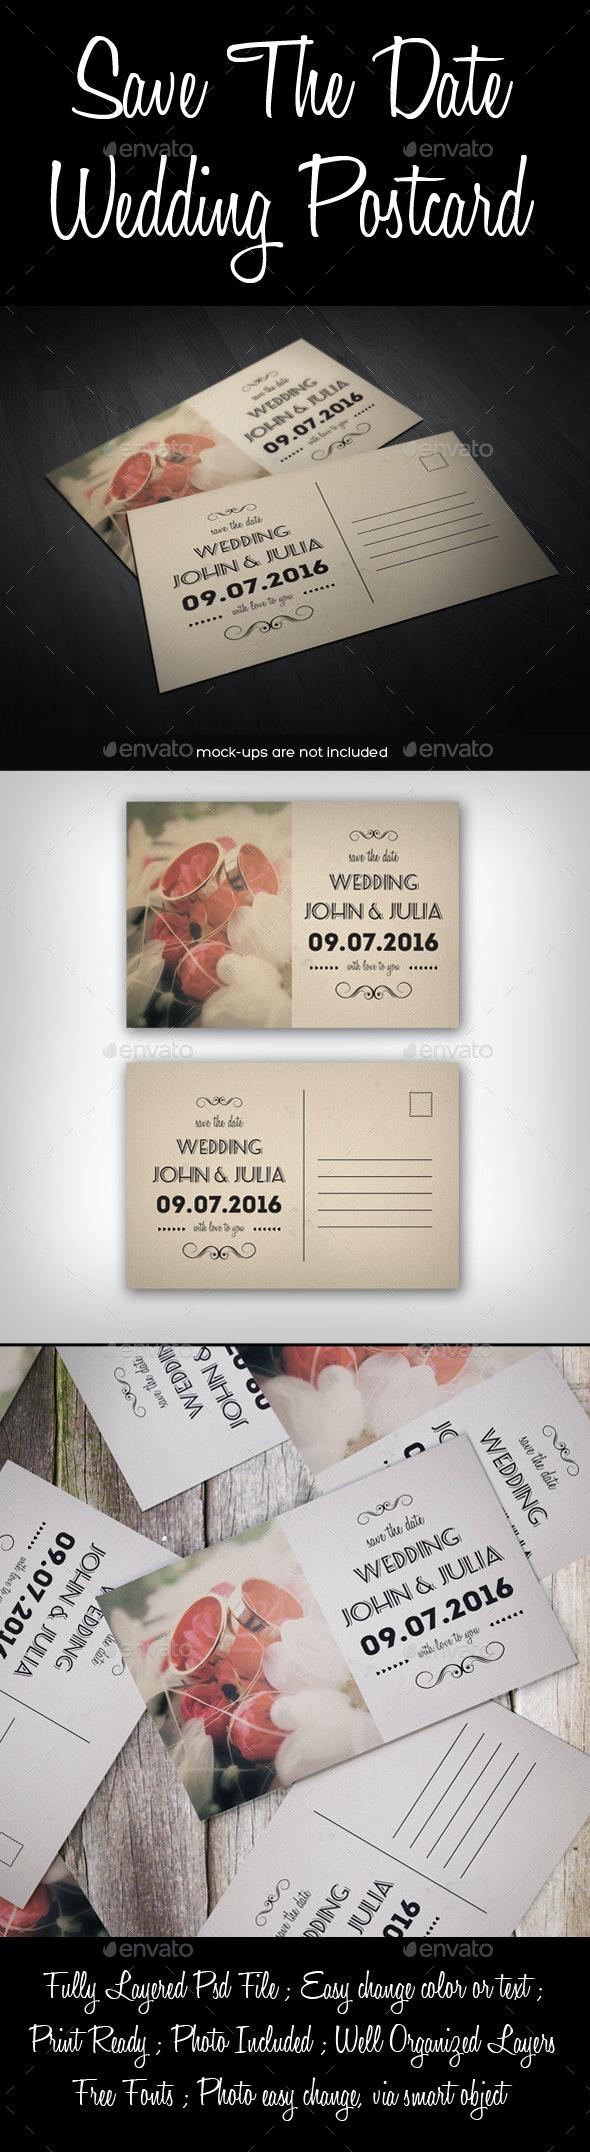 Save The Date Wedding Postcard - Weddings Cards & Invites